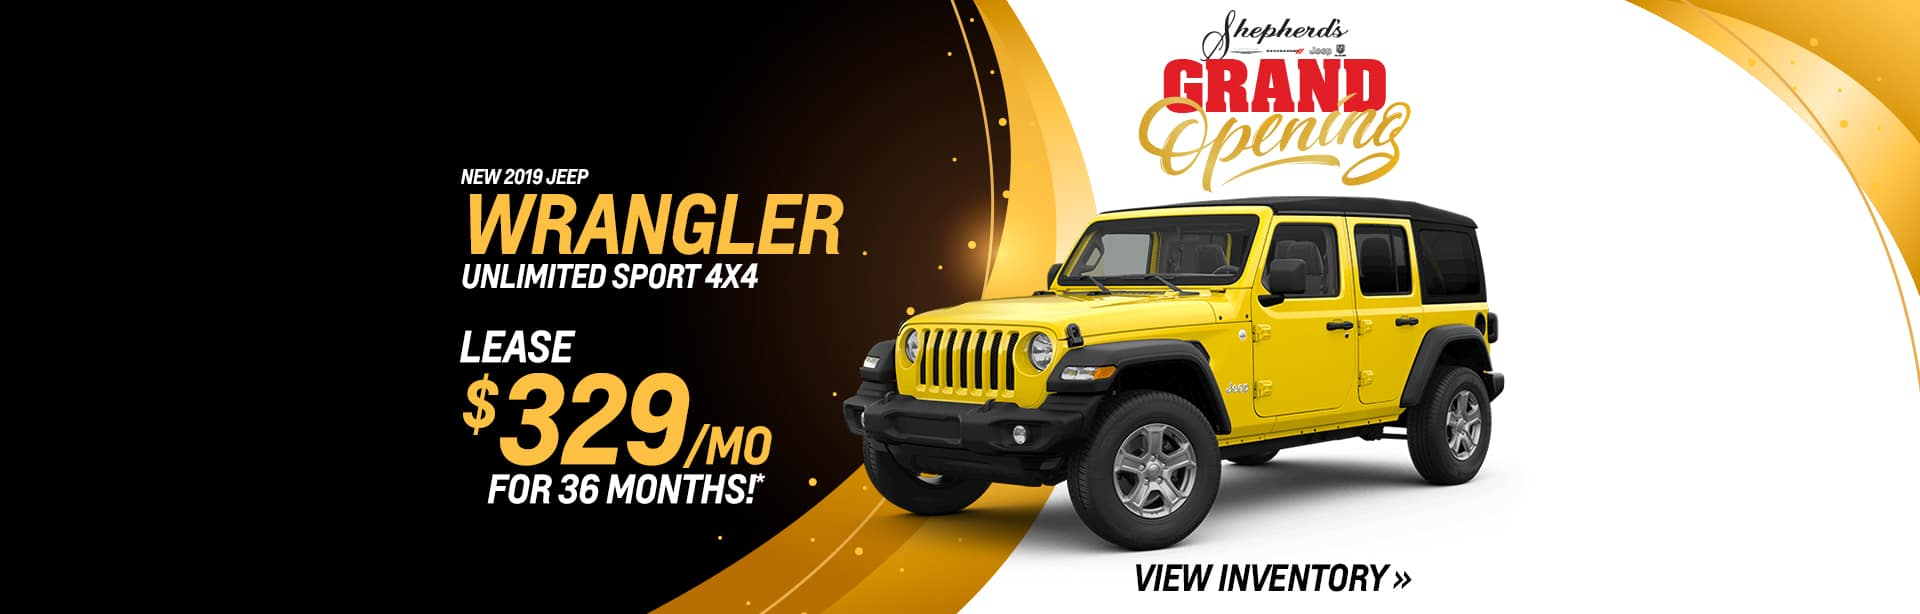 Test Drive a New Jeep Wrangler near Fort Wayne.